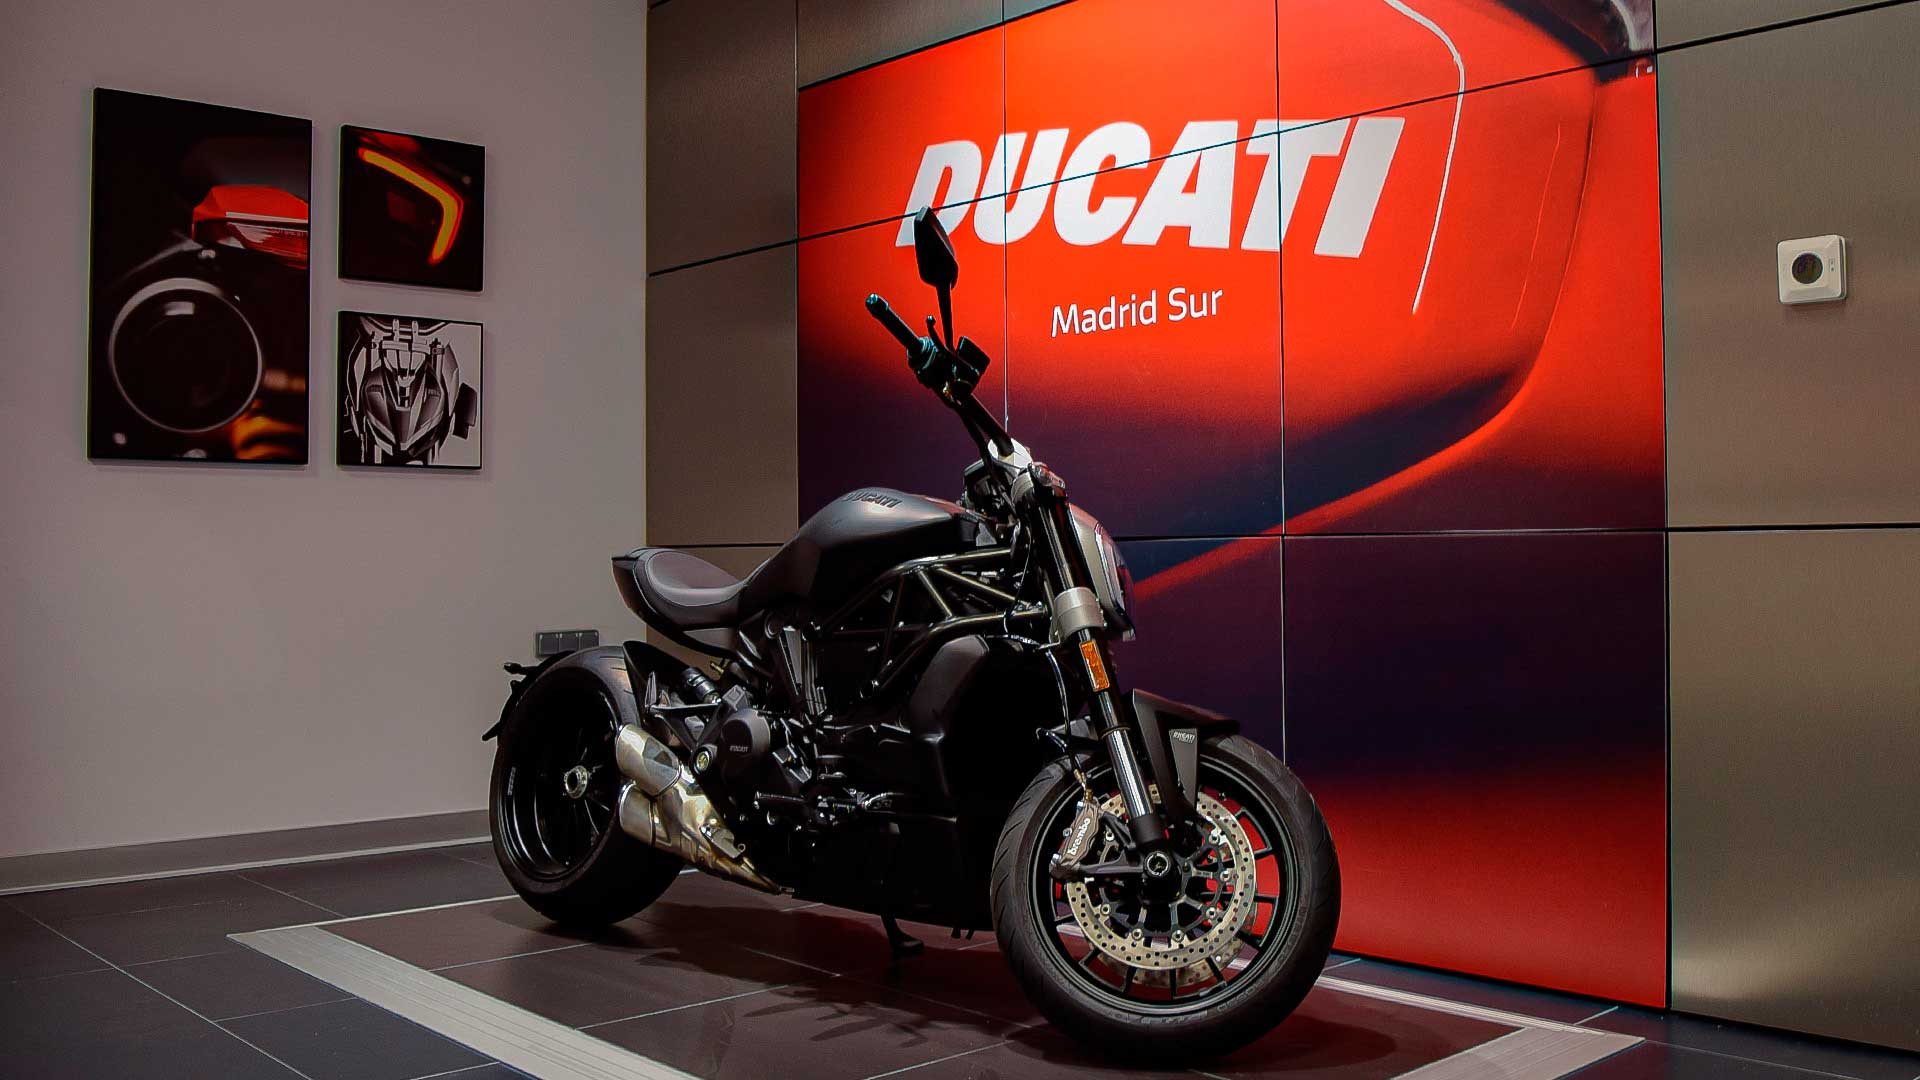 Ducati Madrid Sur abre sus puertas en X-Madrid